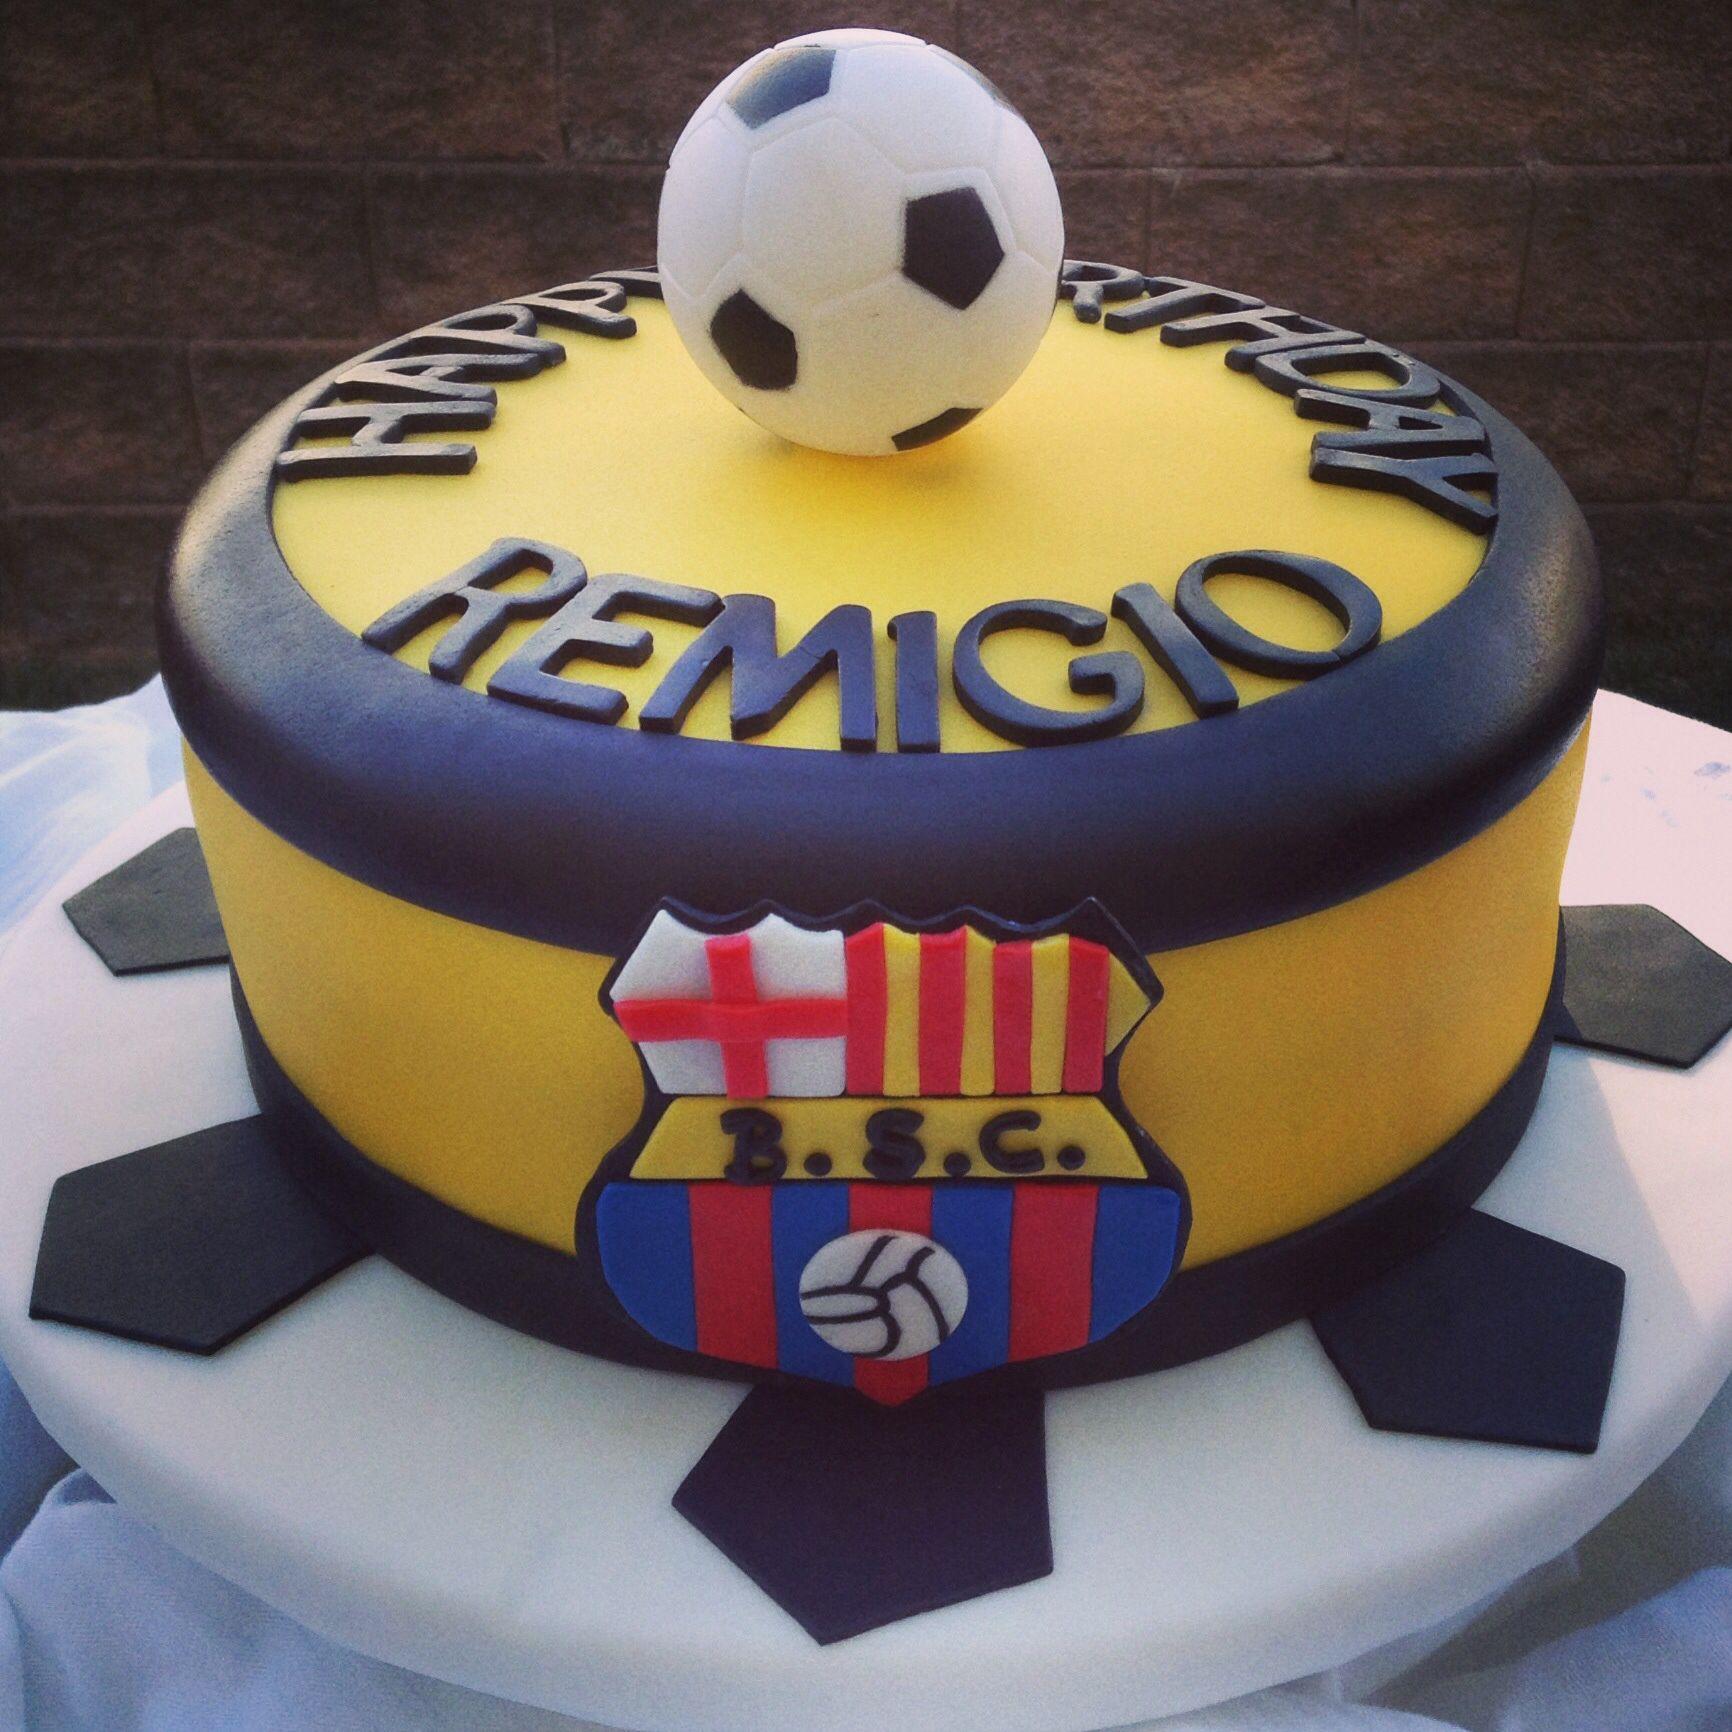 Barcelona Fondant Cake!!! BSC